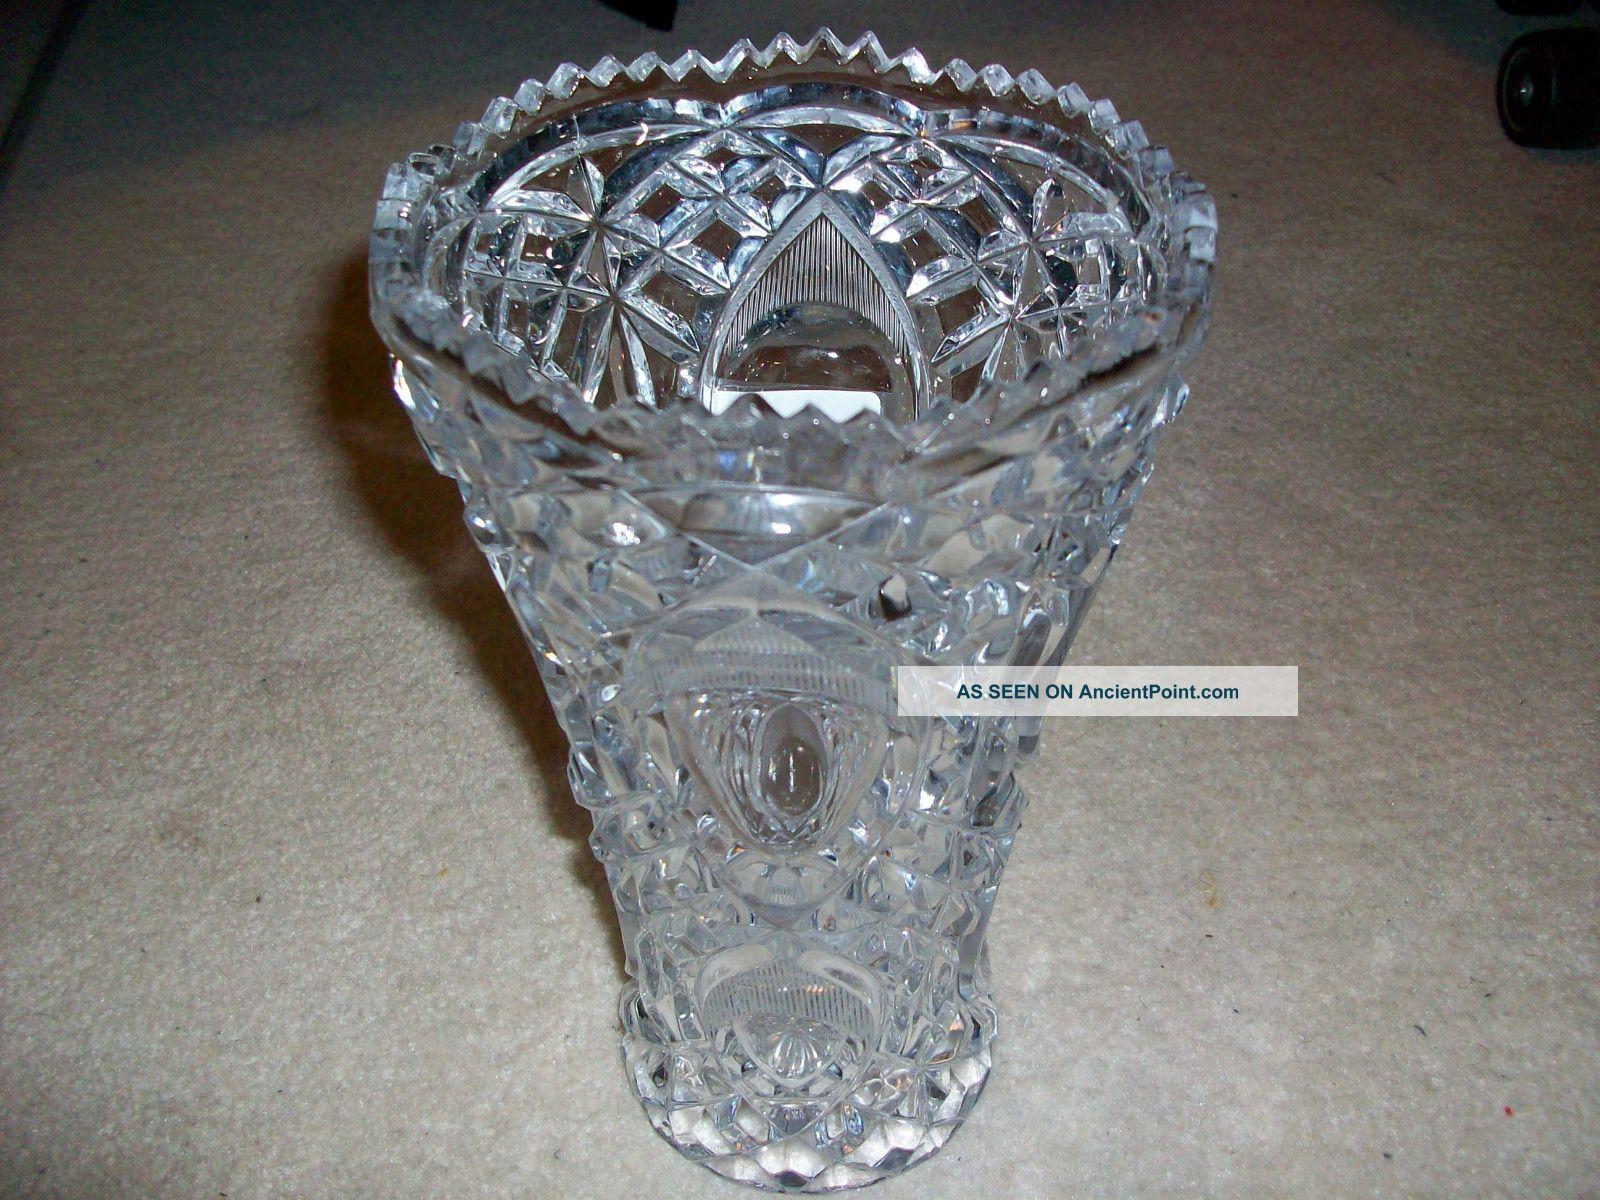 Antique glass vases images antique art rare old cut glass reviewsmspy